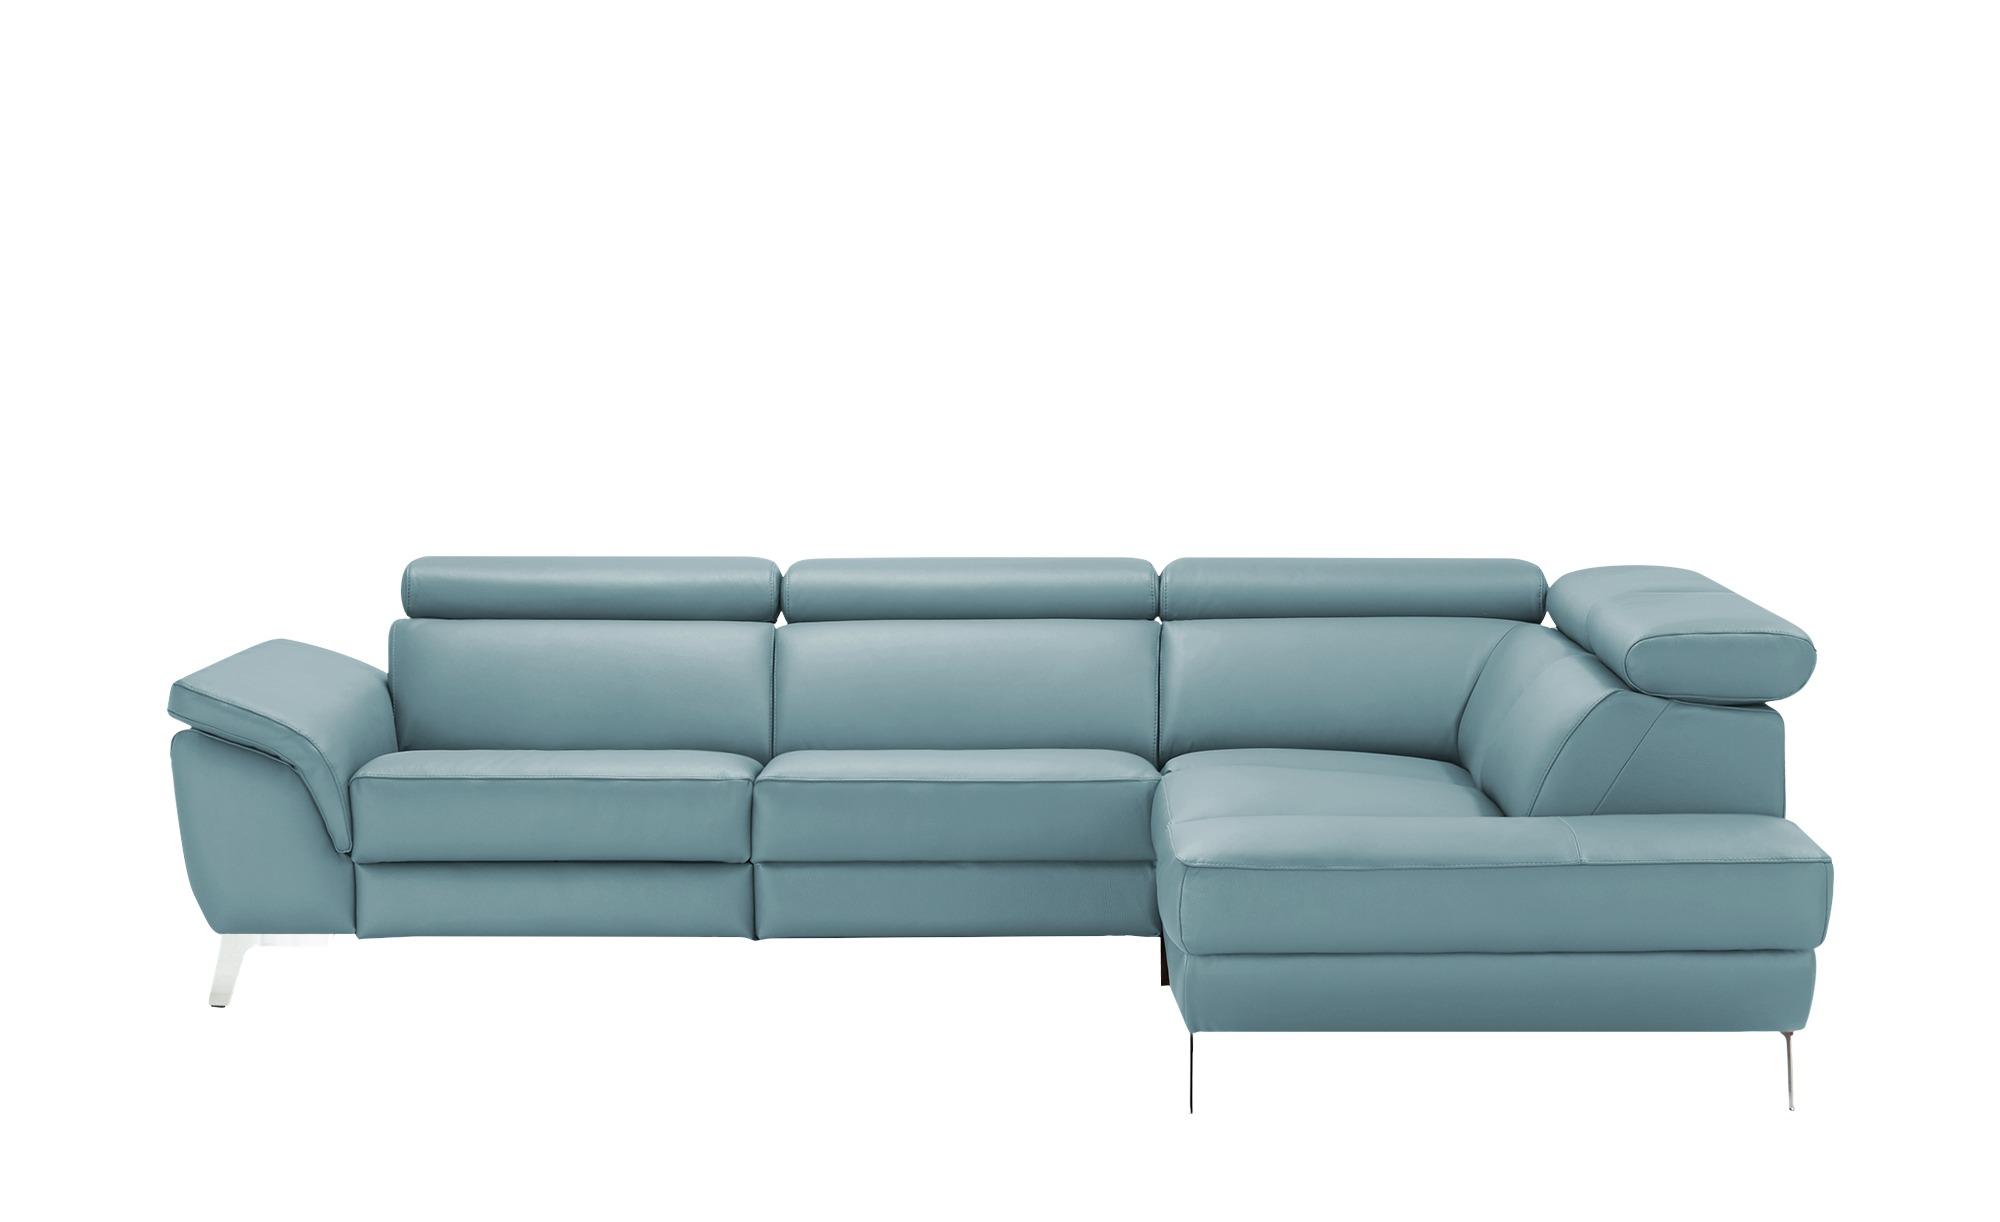 uno Ecksofa Leder  Dallas ¦ blau ¦ Maße (cm): H: 74 Polstermöbel > Sofas > Ecksofas - Höffner